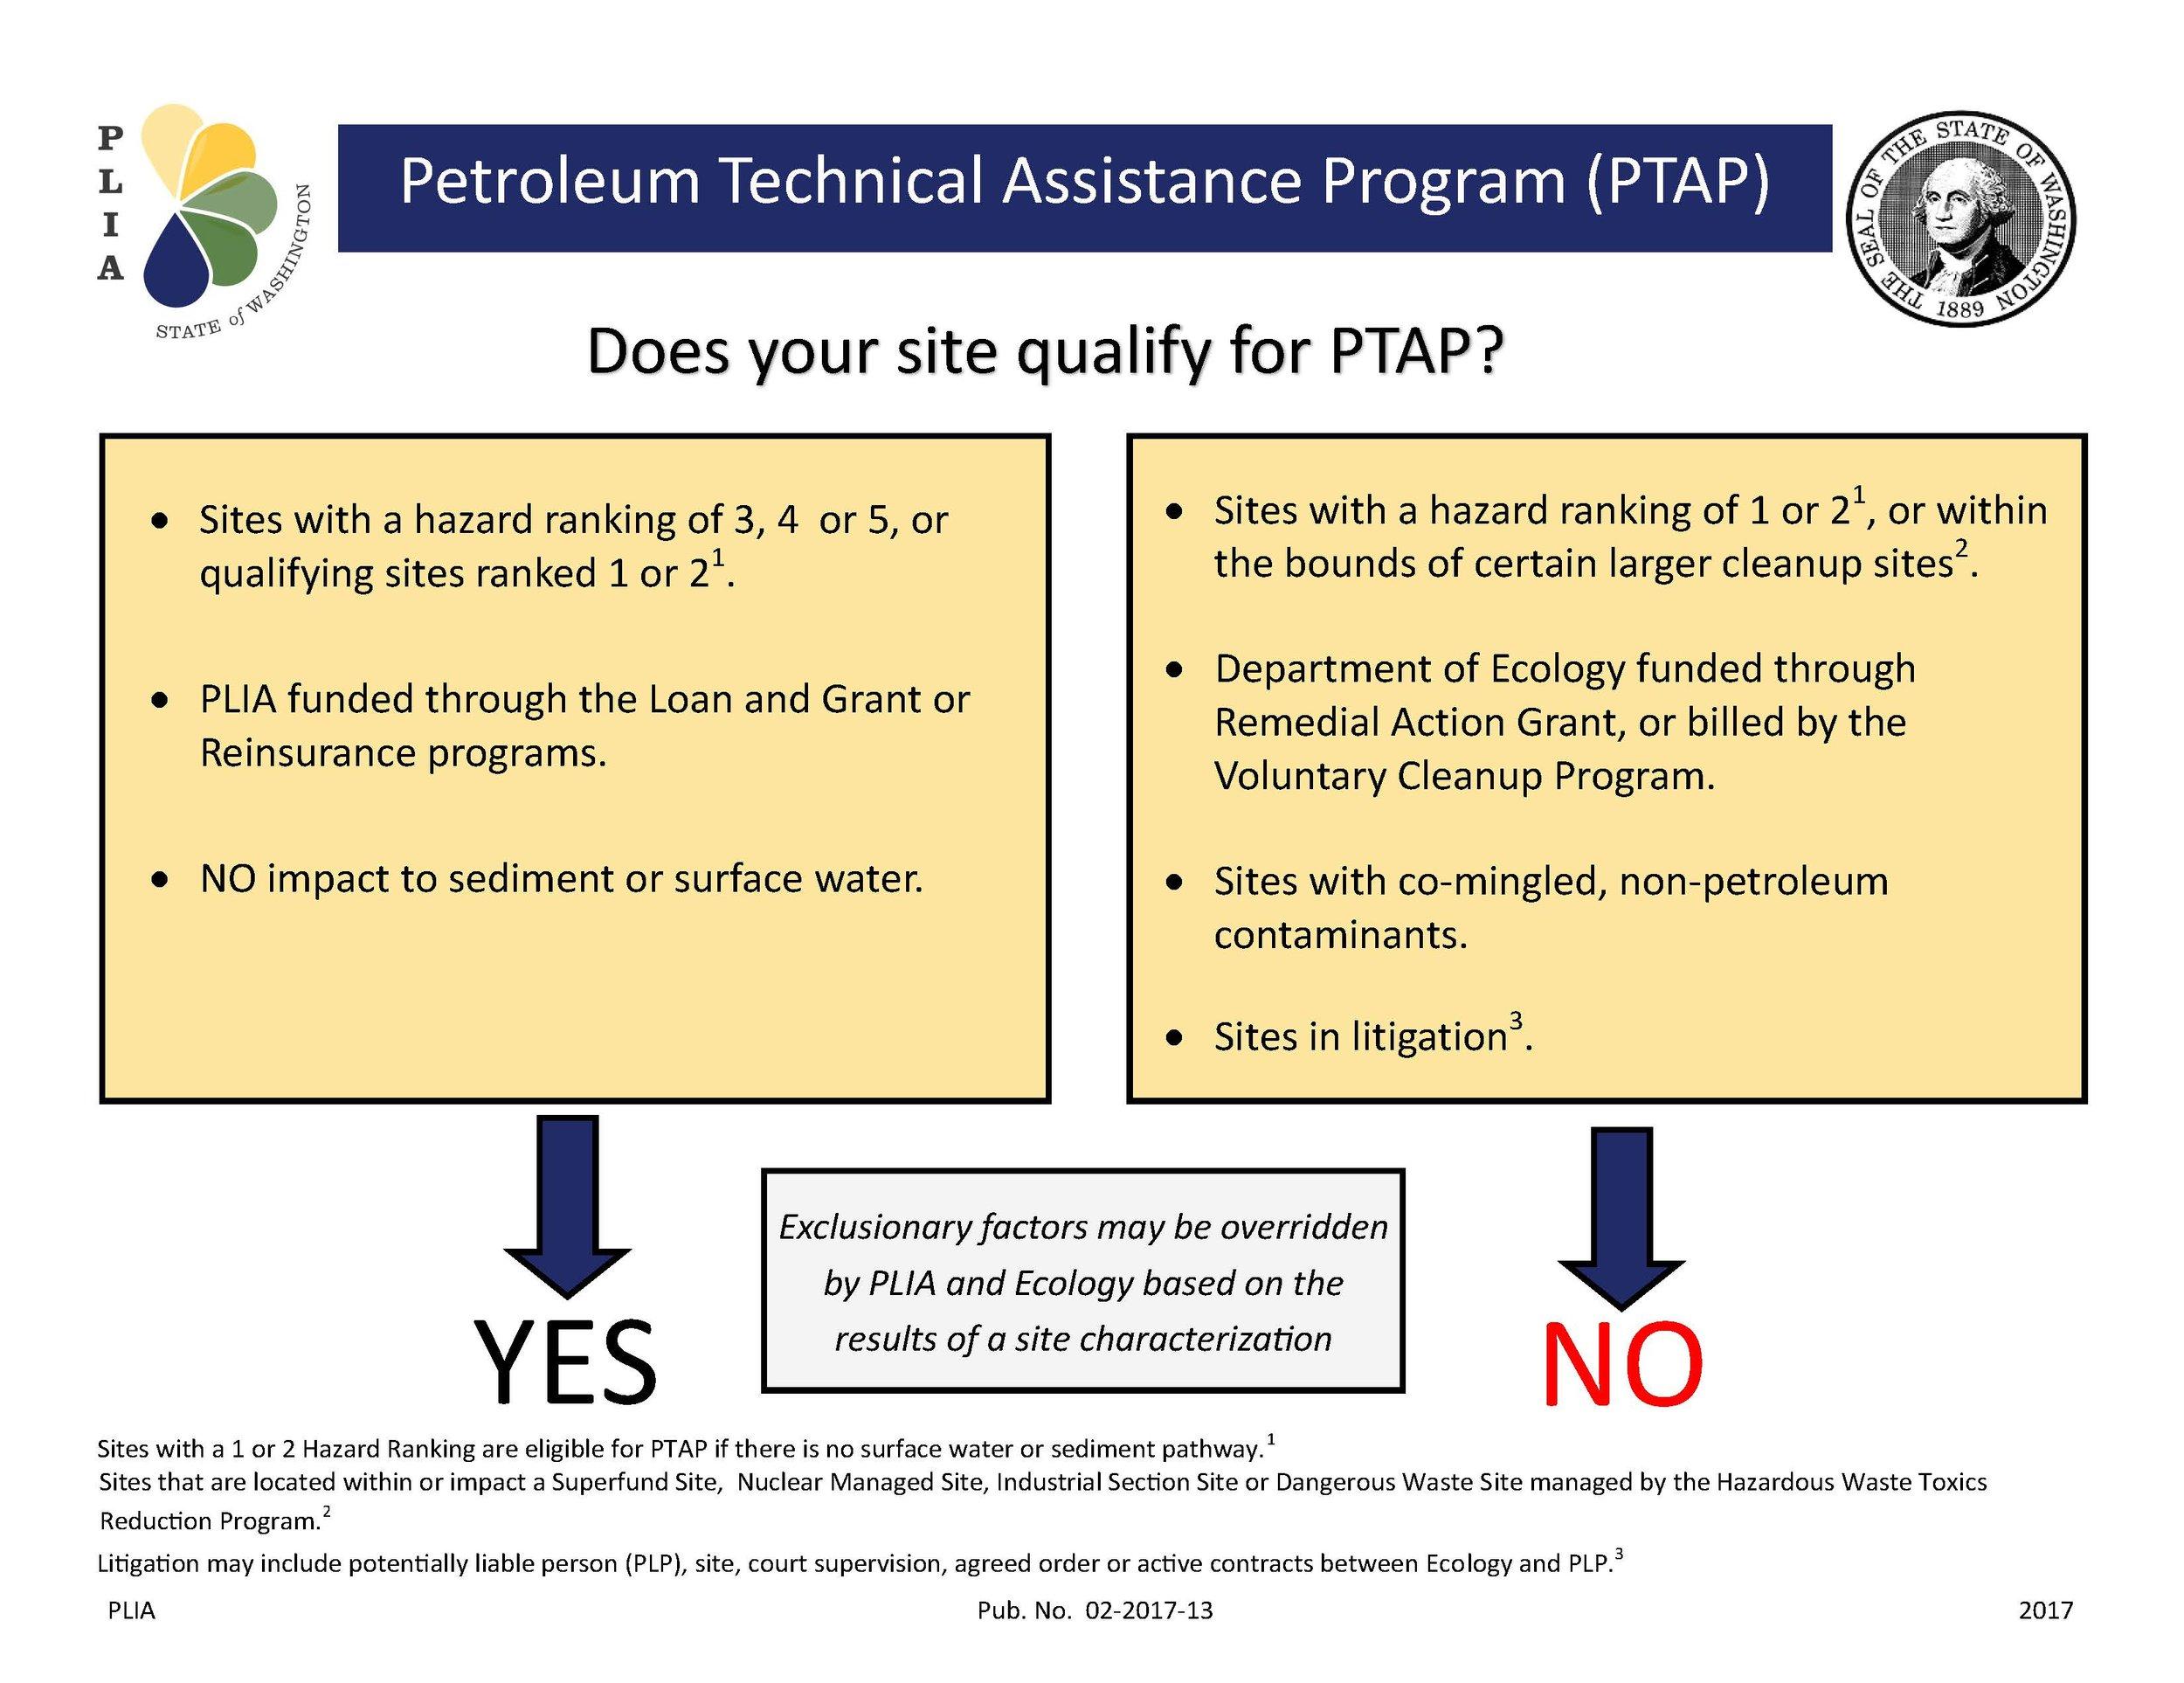 PTAP eligibility criteria.